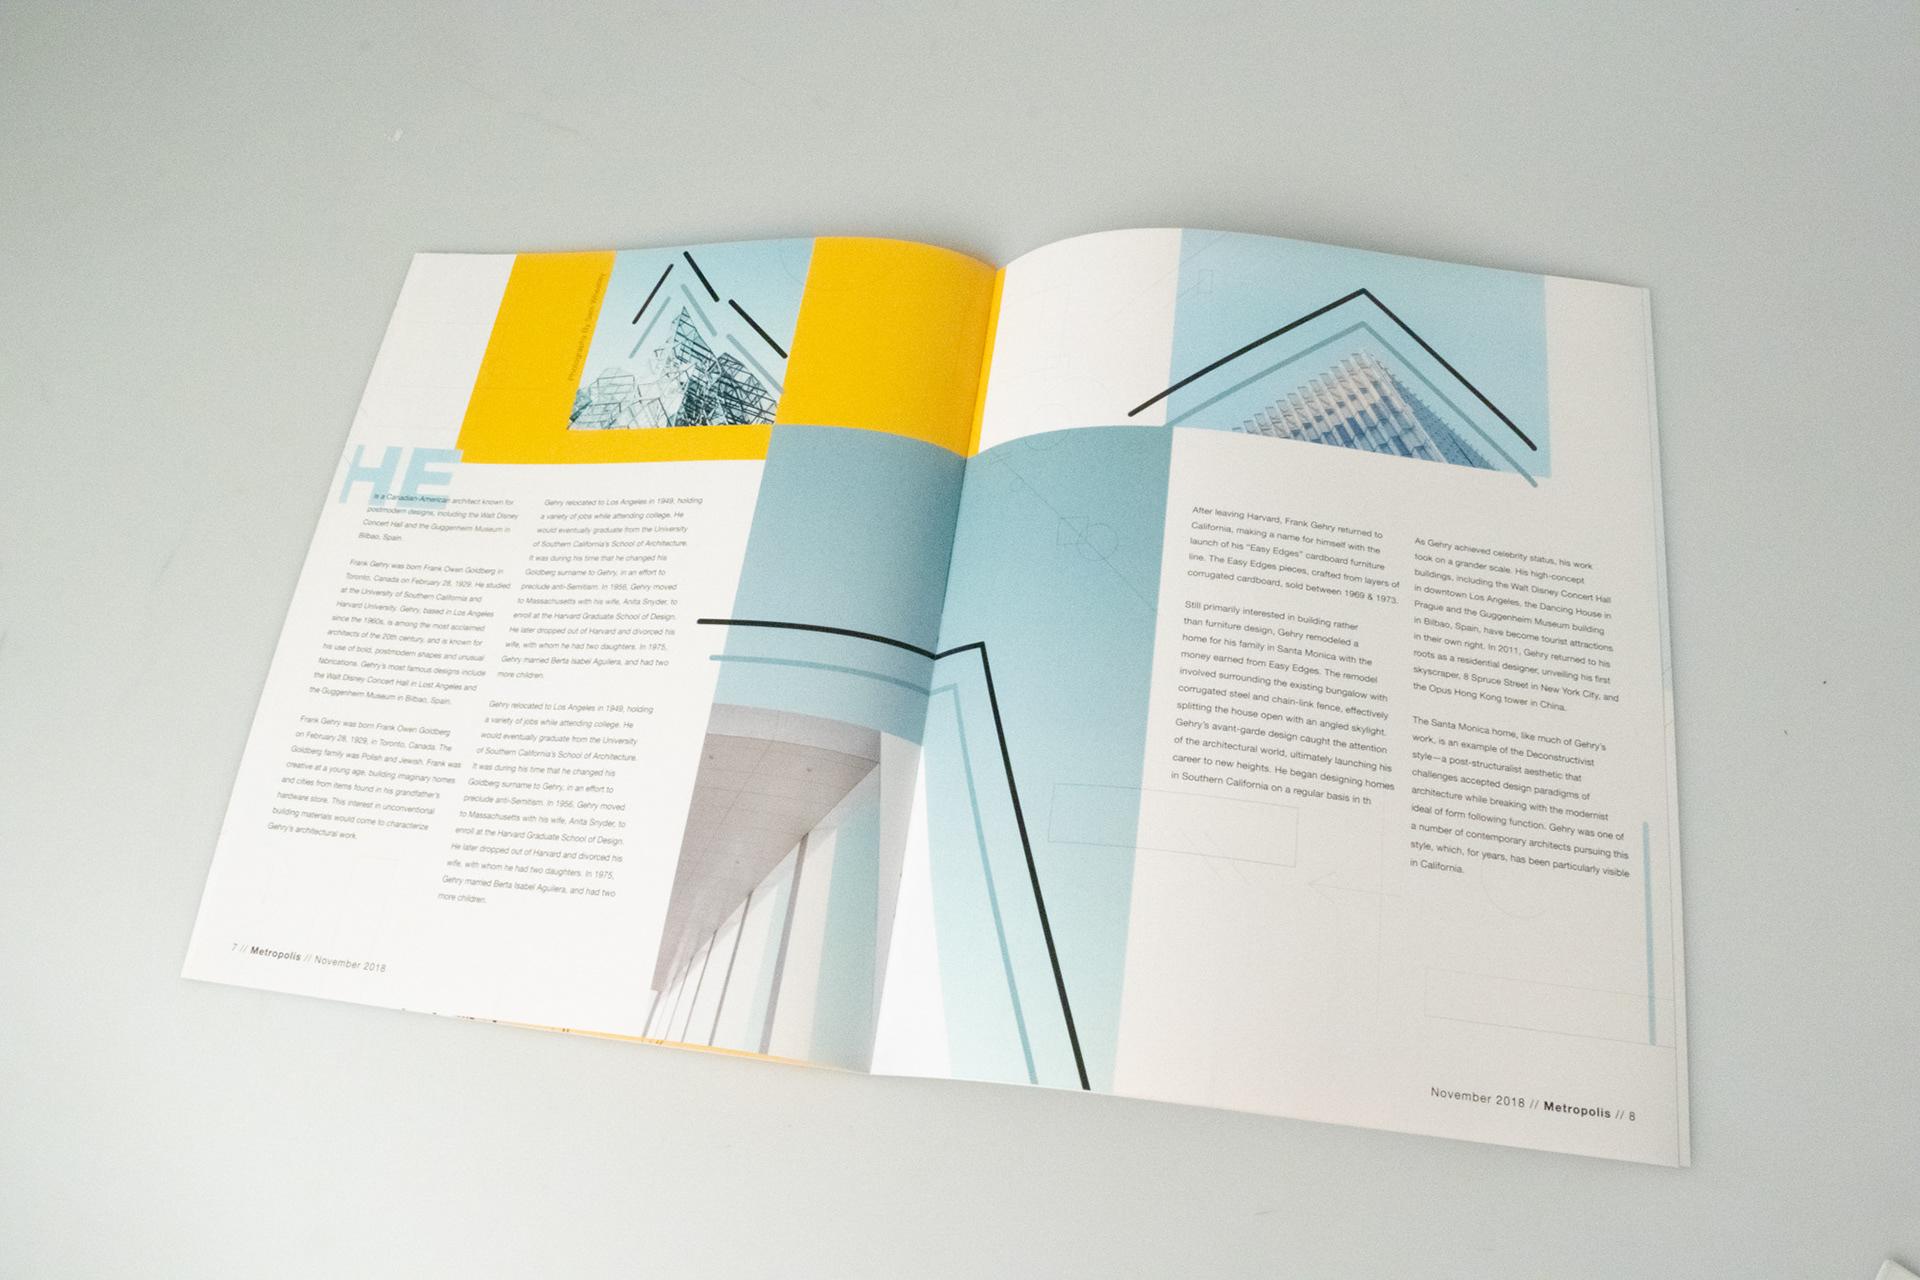 Redesigned Magazine - Metropolis on Behance